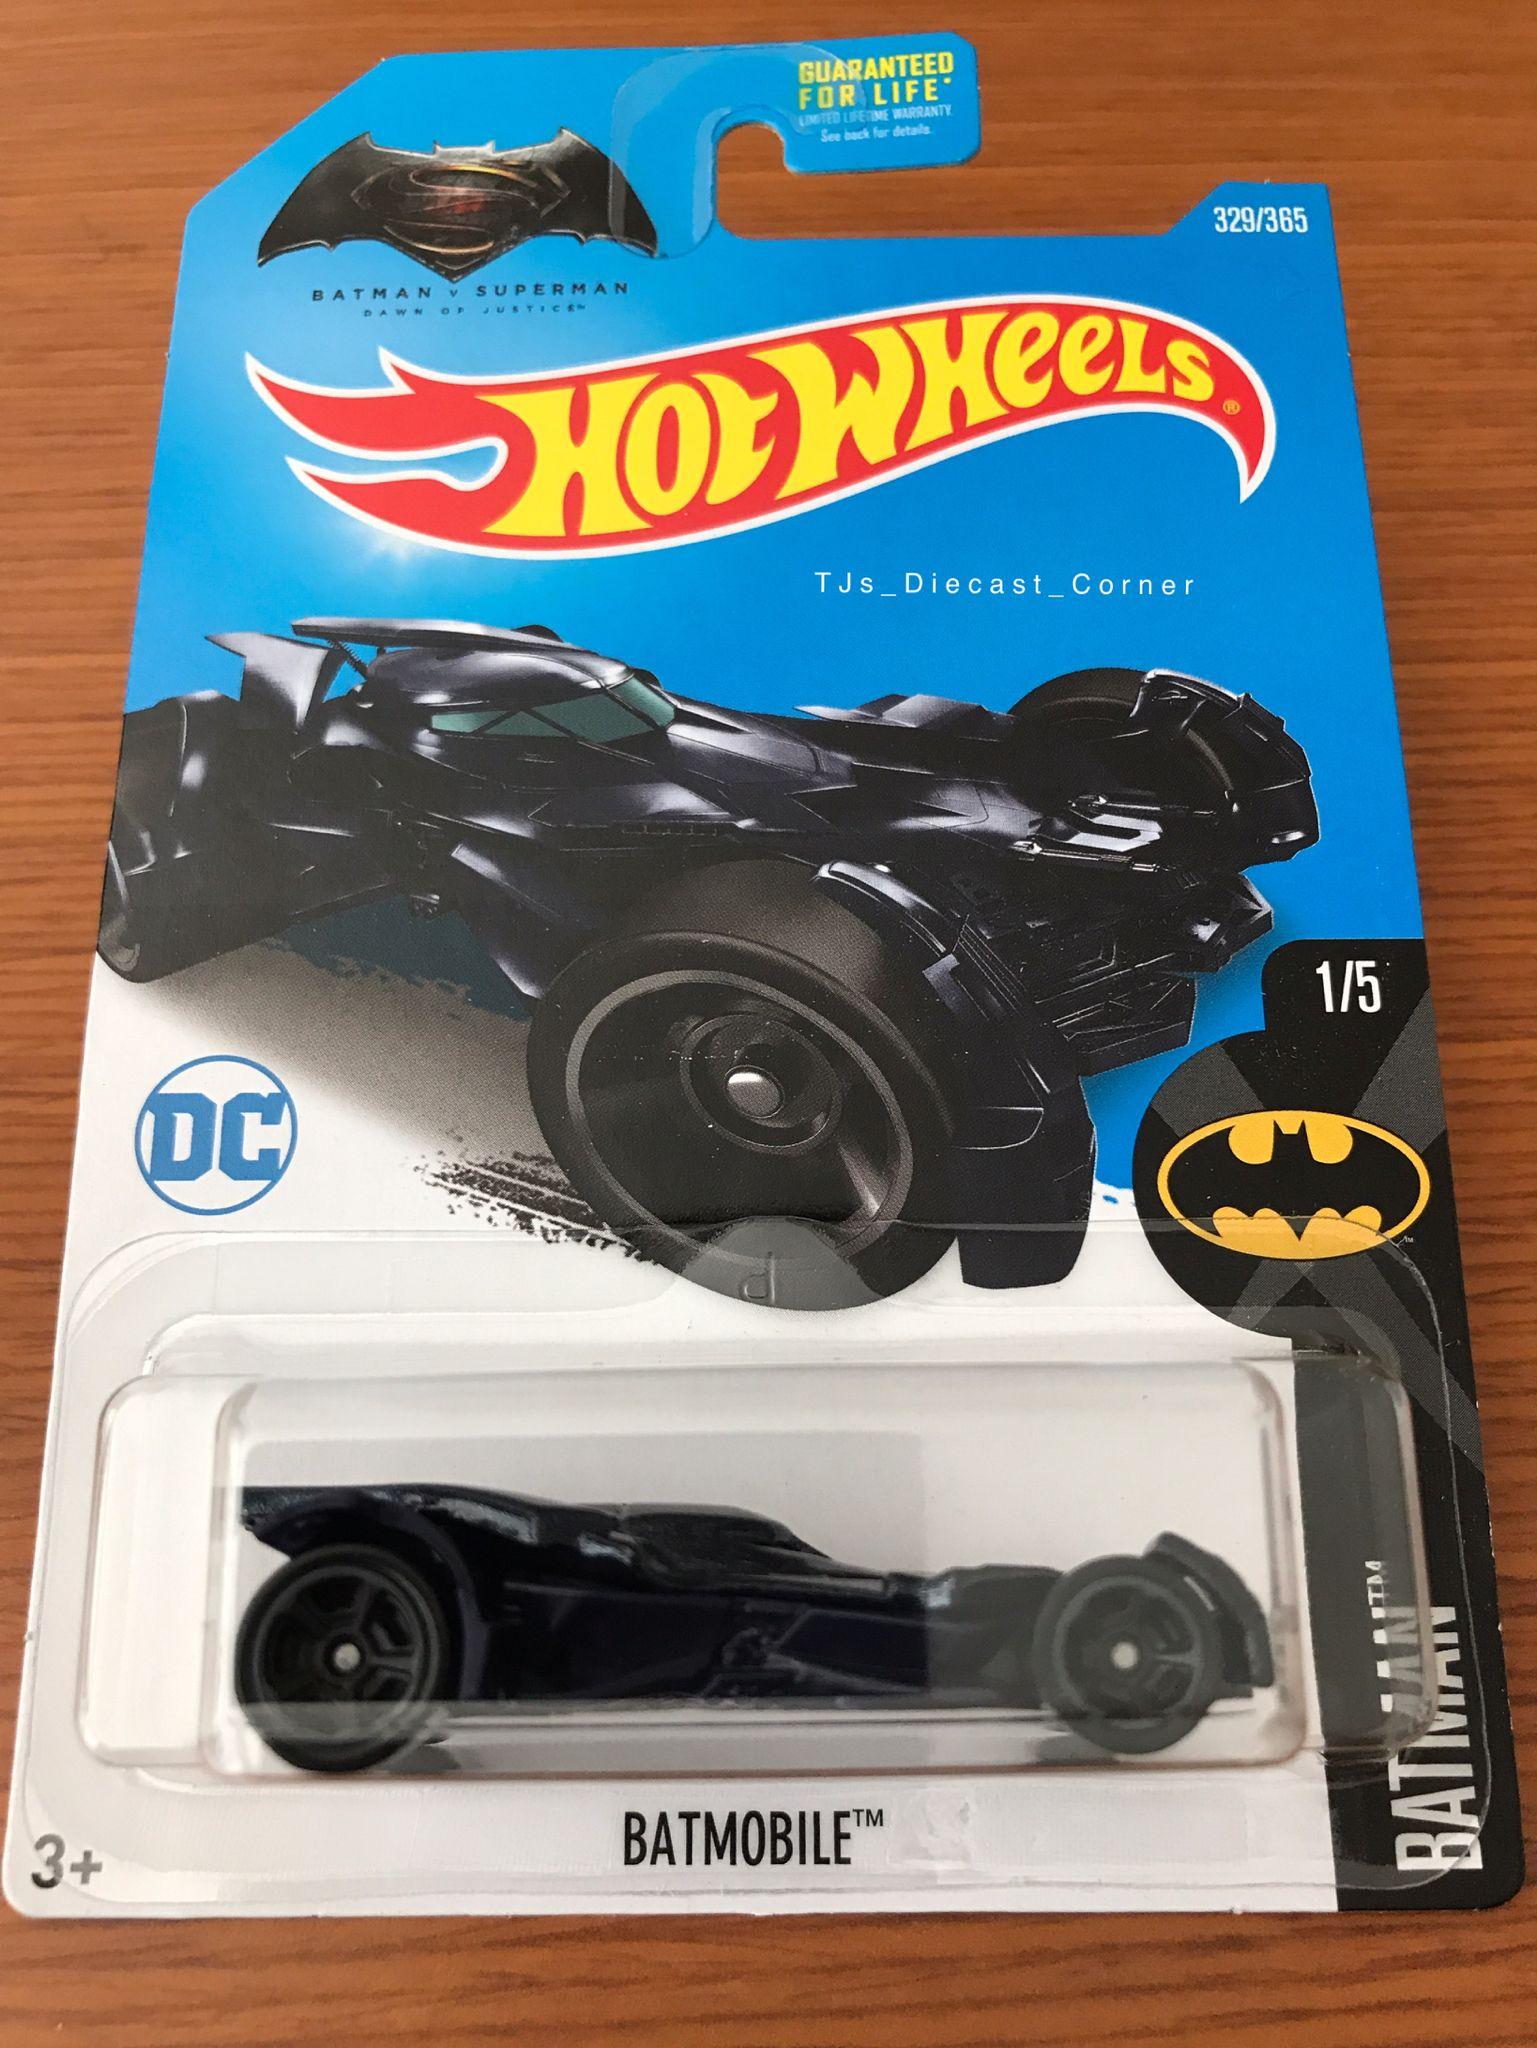 2017 Hot Wheels Bvss Batmobile Black And Purple Variant With